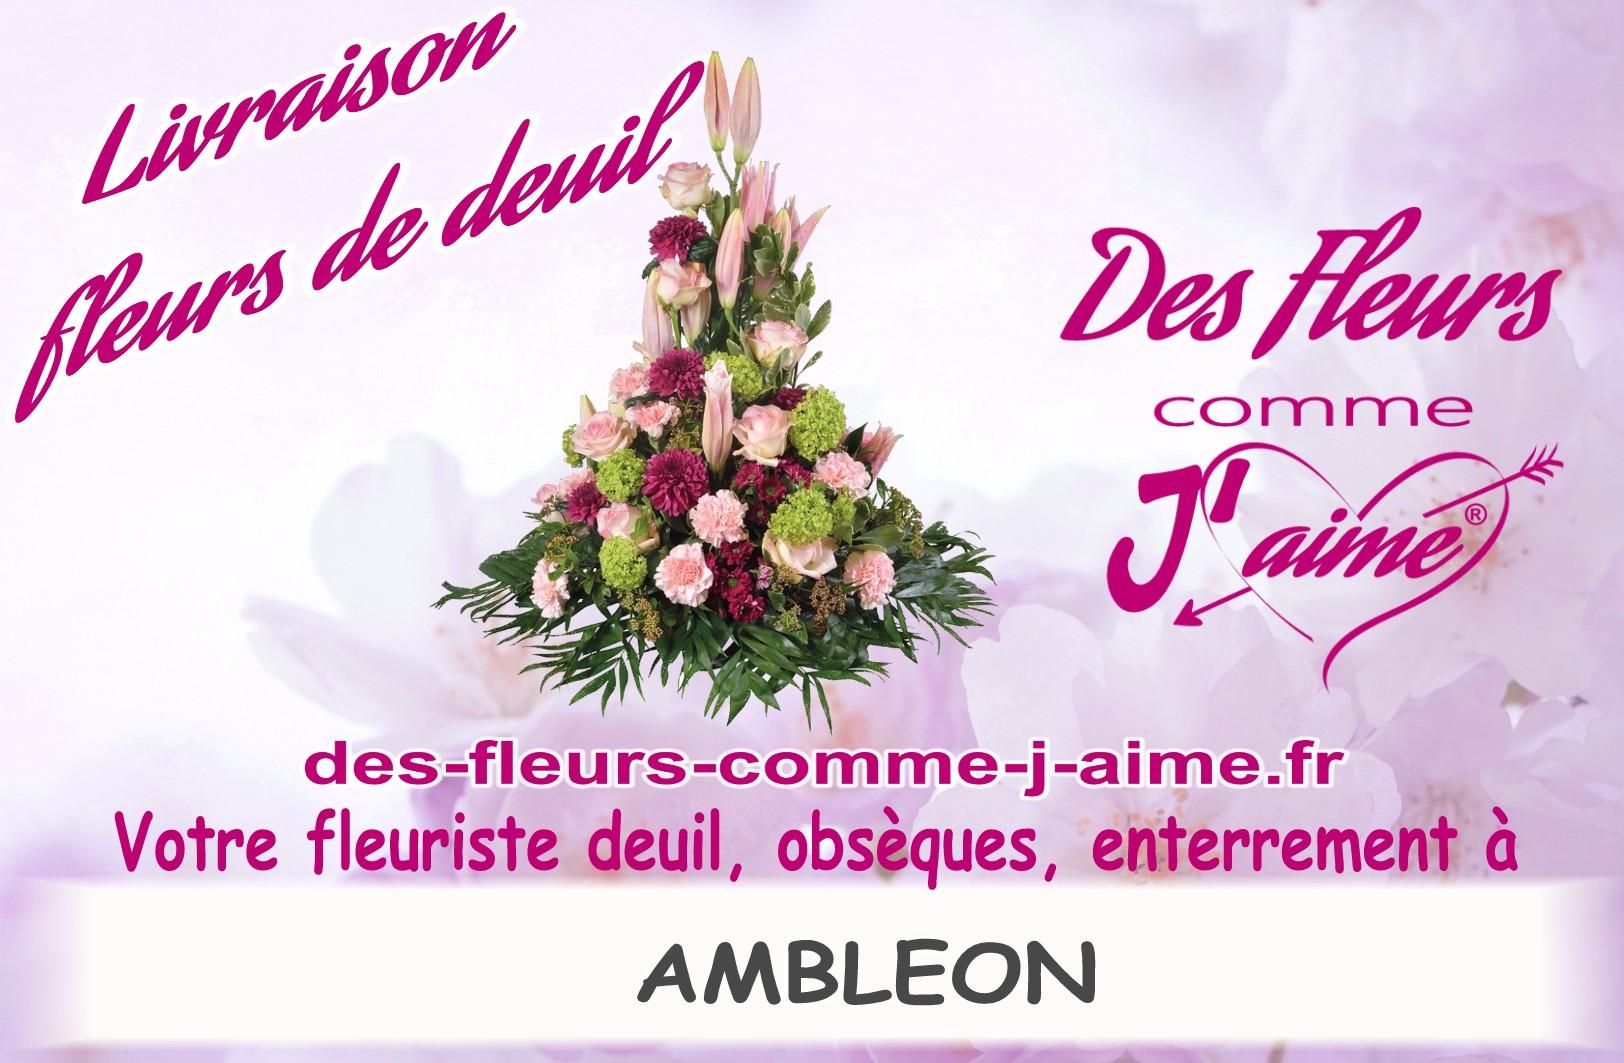 FLEURS DEUIL AMBLEON